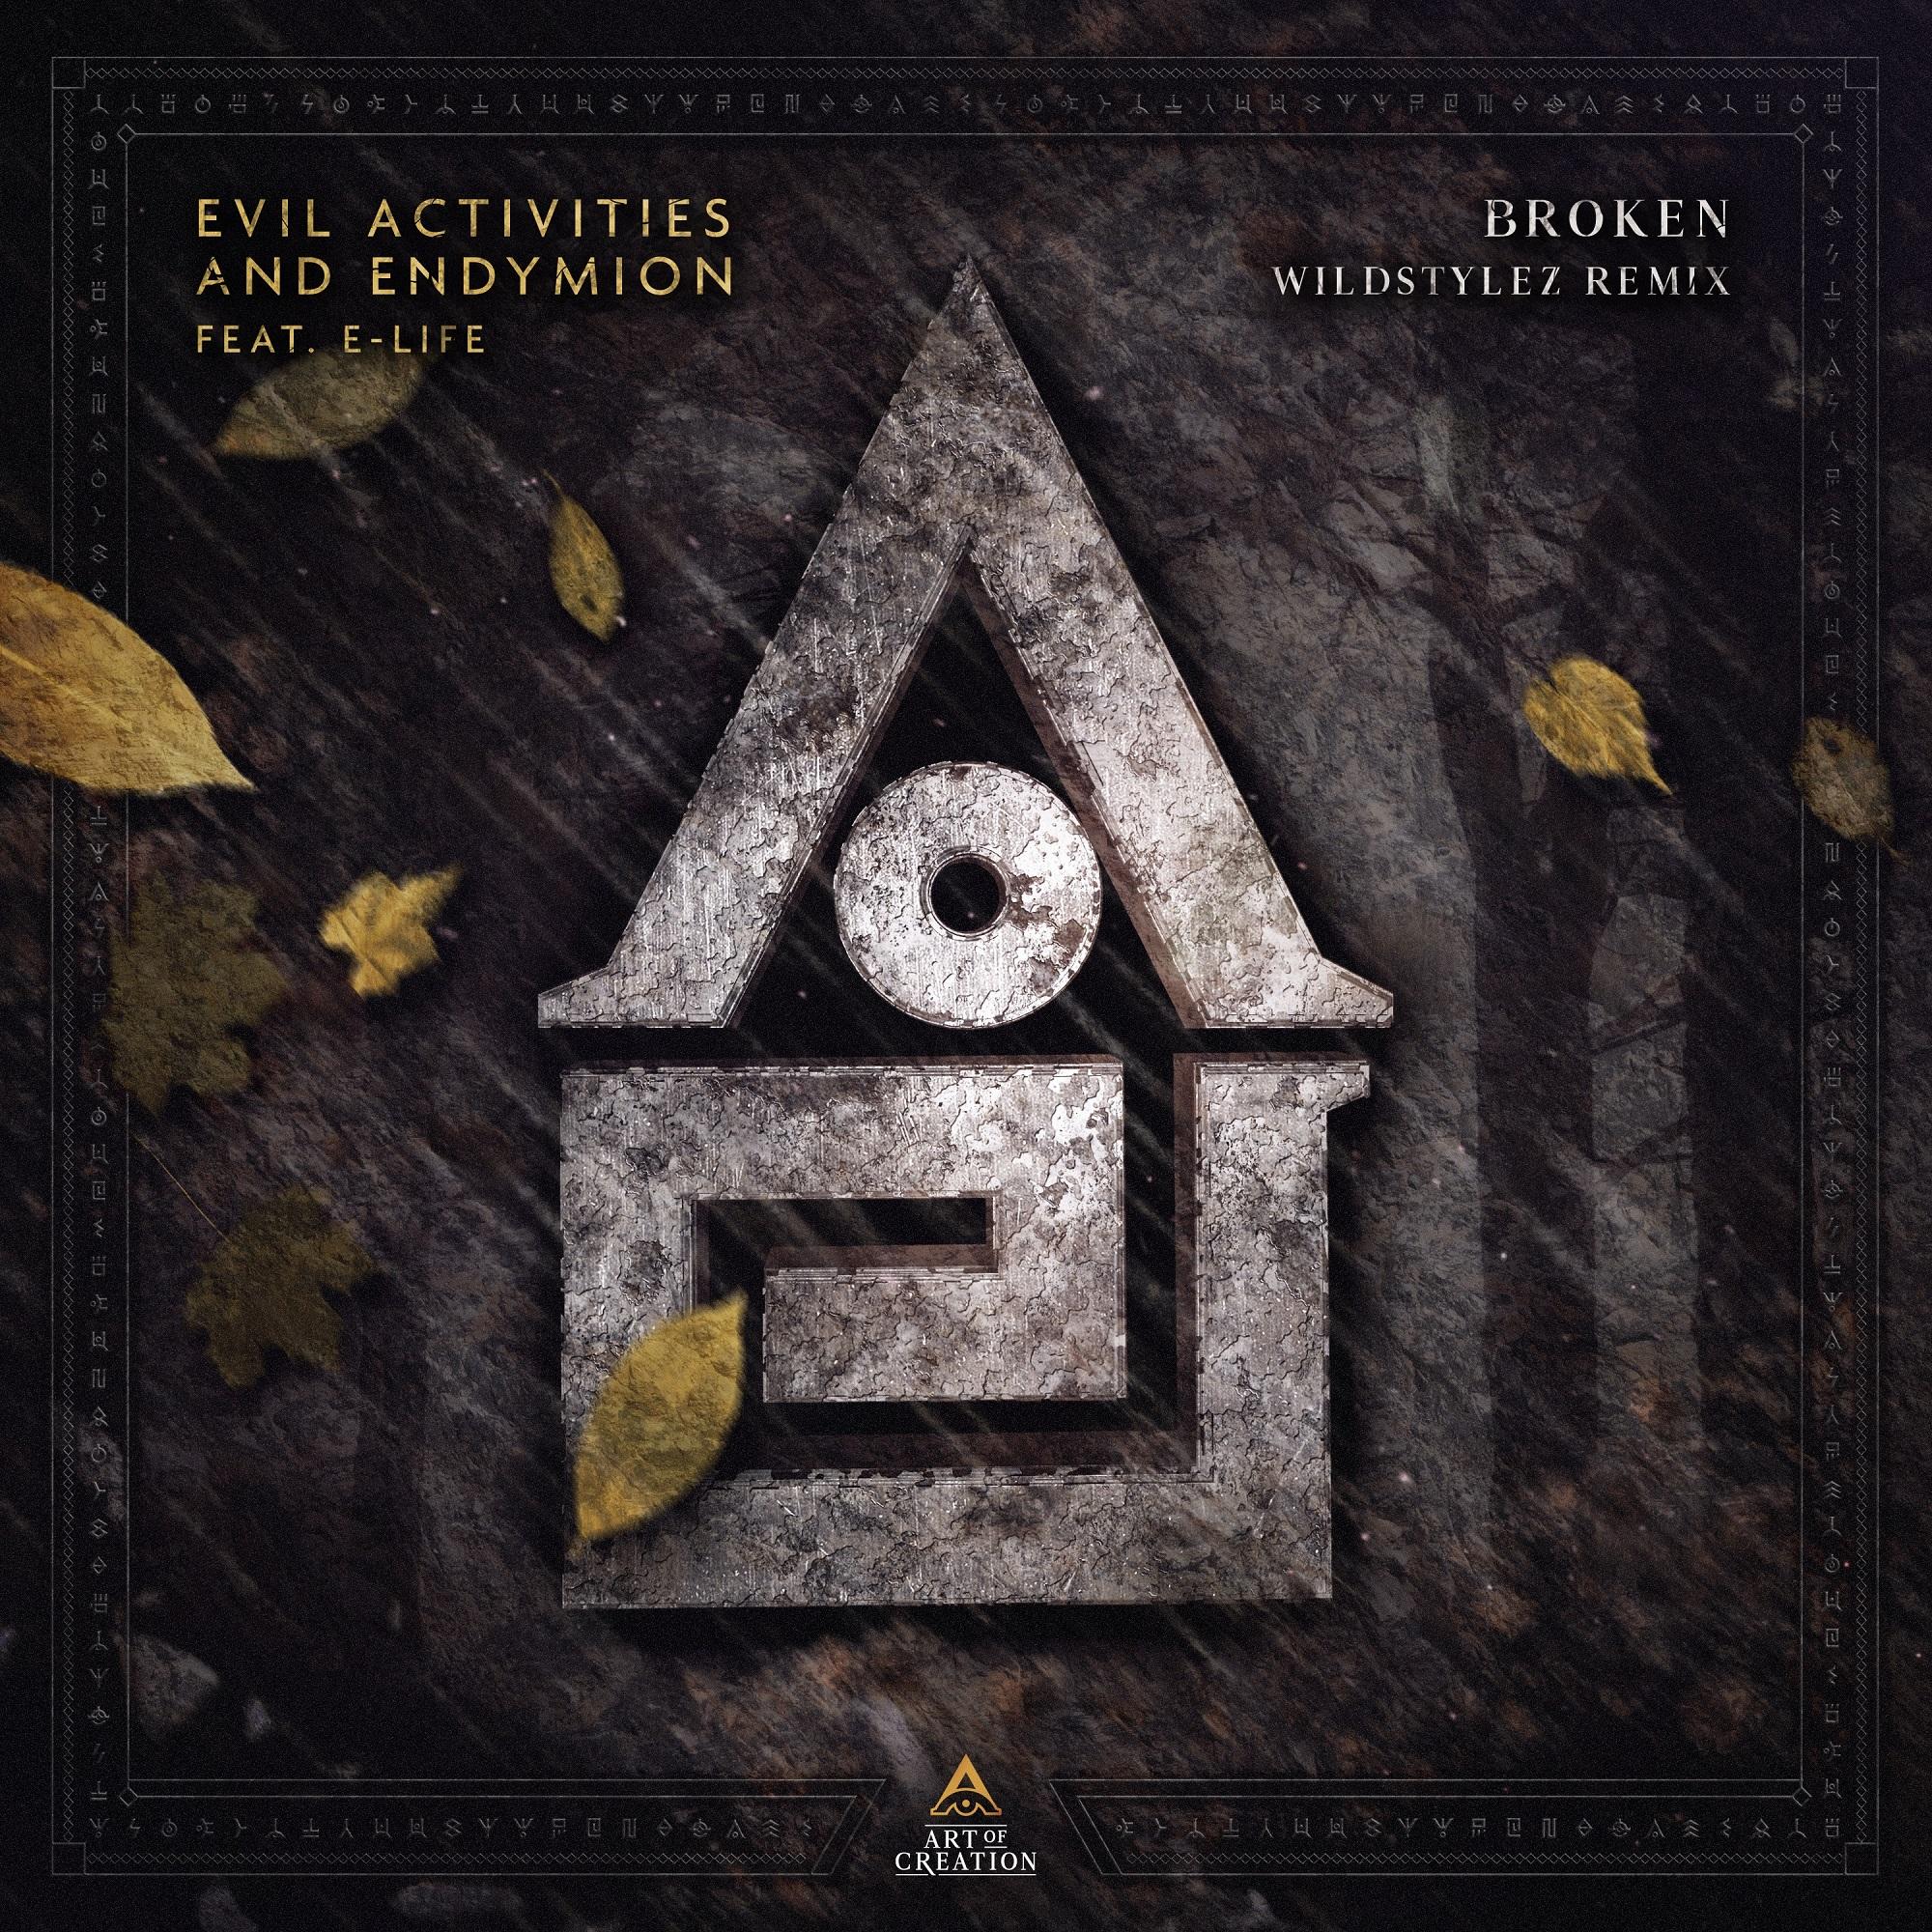 AOC002 _Evil Activities & Endymion feat. E-Life - Broken (Wildstylez Remix) Cover 2000 x2000